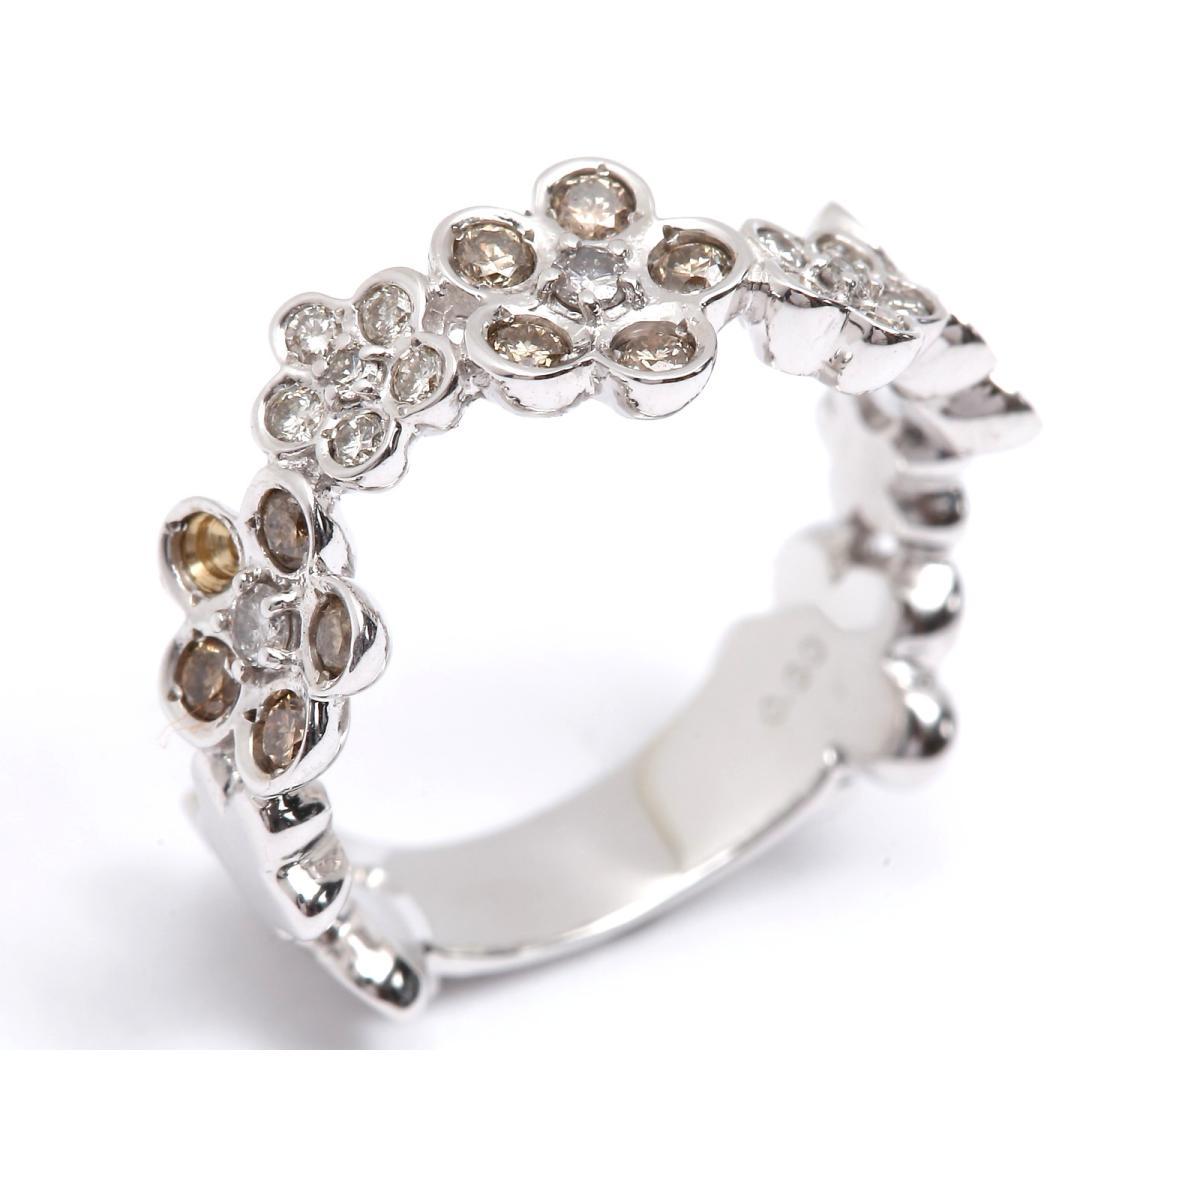 9ac45d8759b2 最大24回 | ジュエリー ダイヤモンド リング 指輪 レディース K18WG (750) ホワイトゴールド x ダイヤモンド0.60ct | |  JEWELRY BRANDOFF ブランドオフ アクセサリー